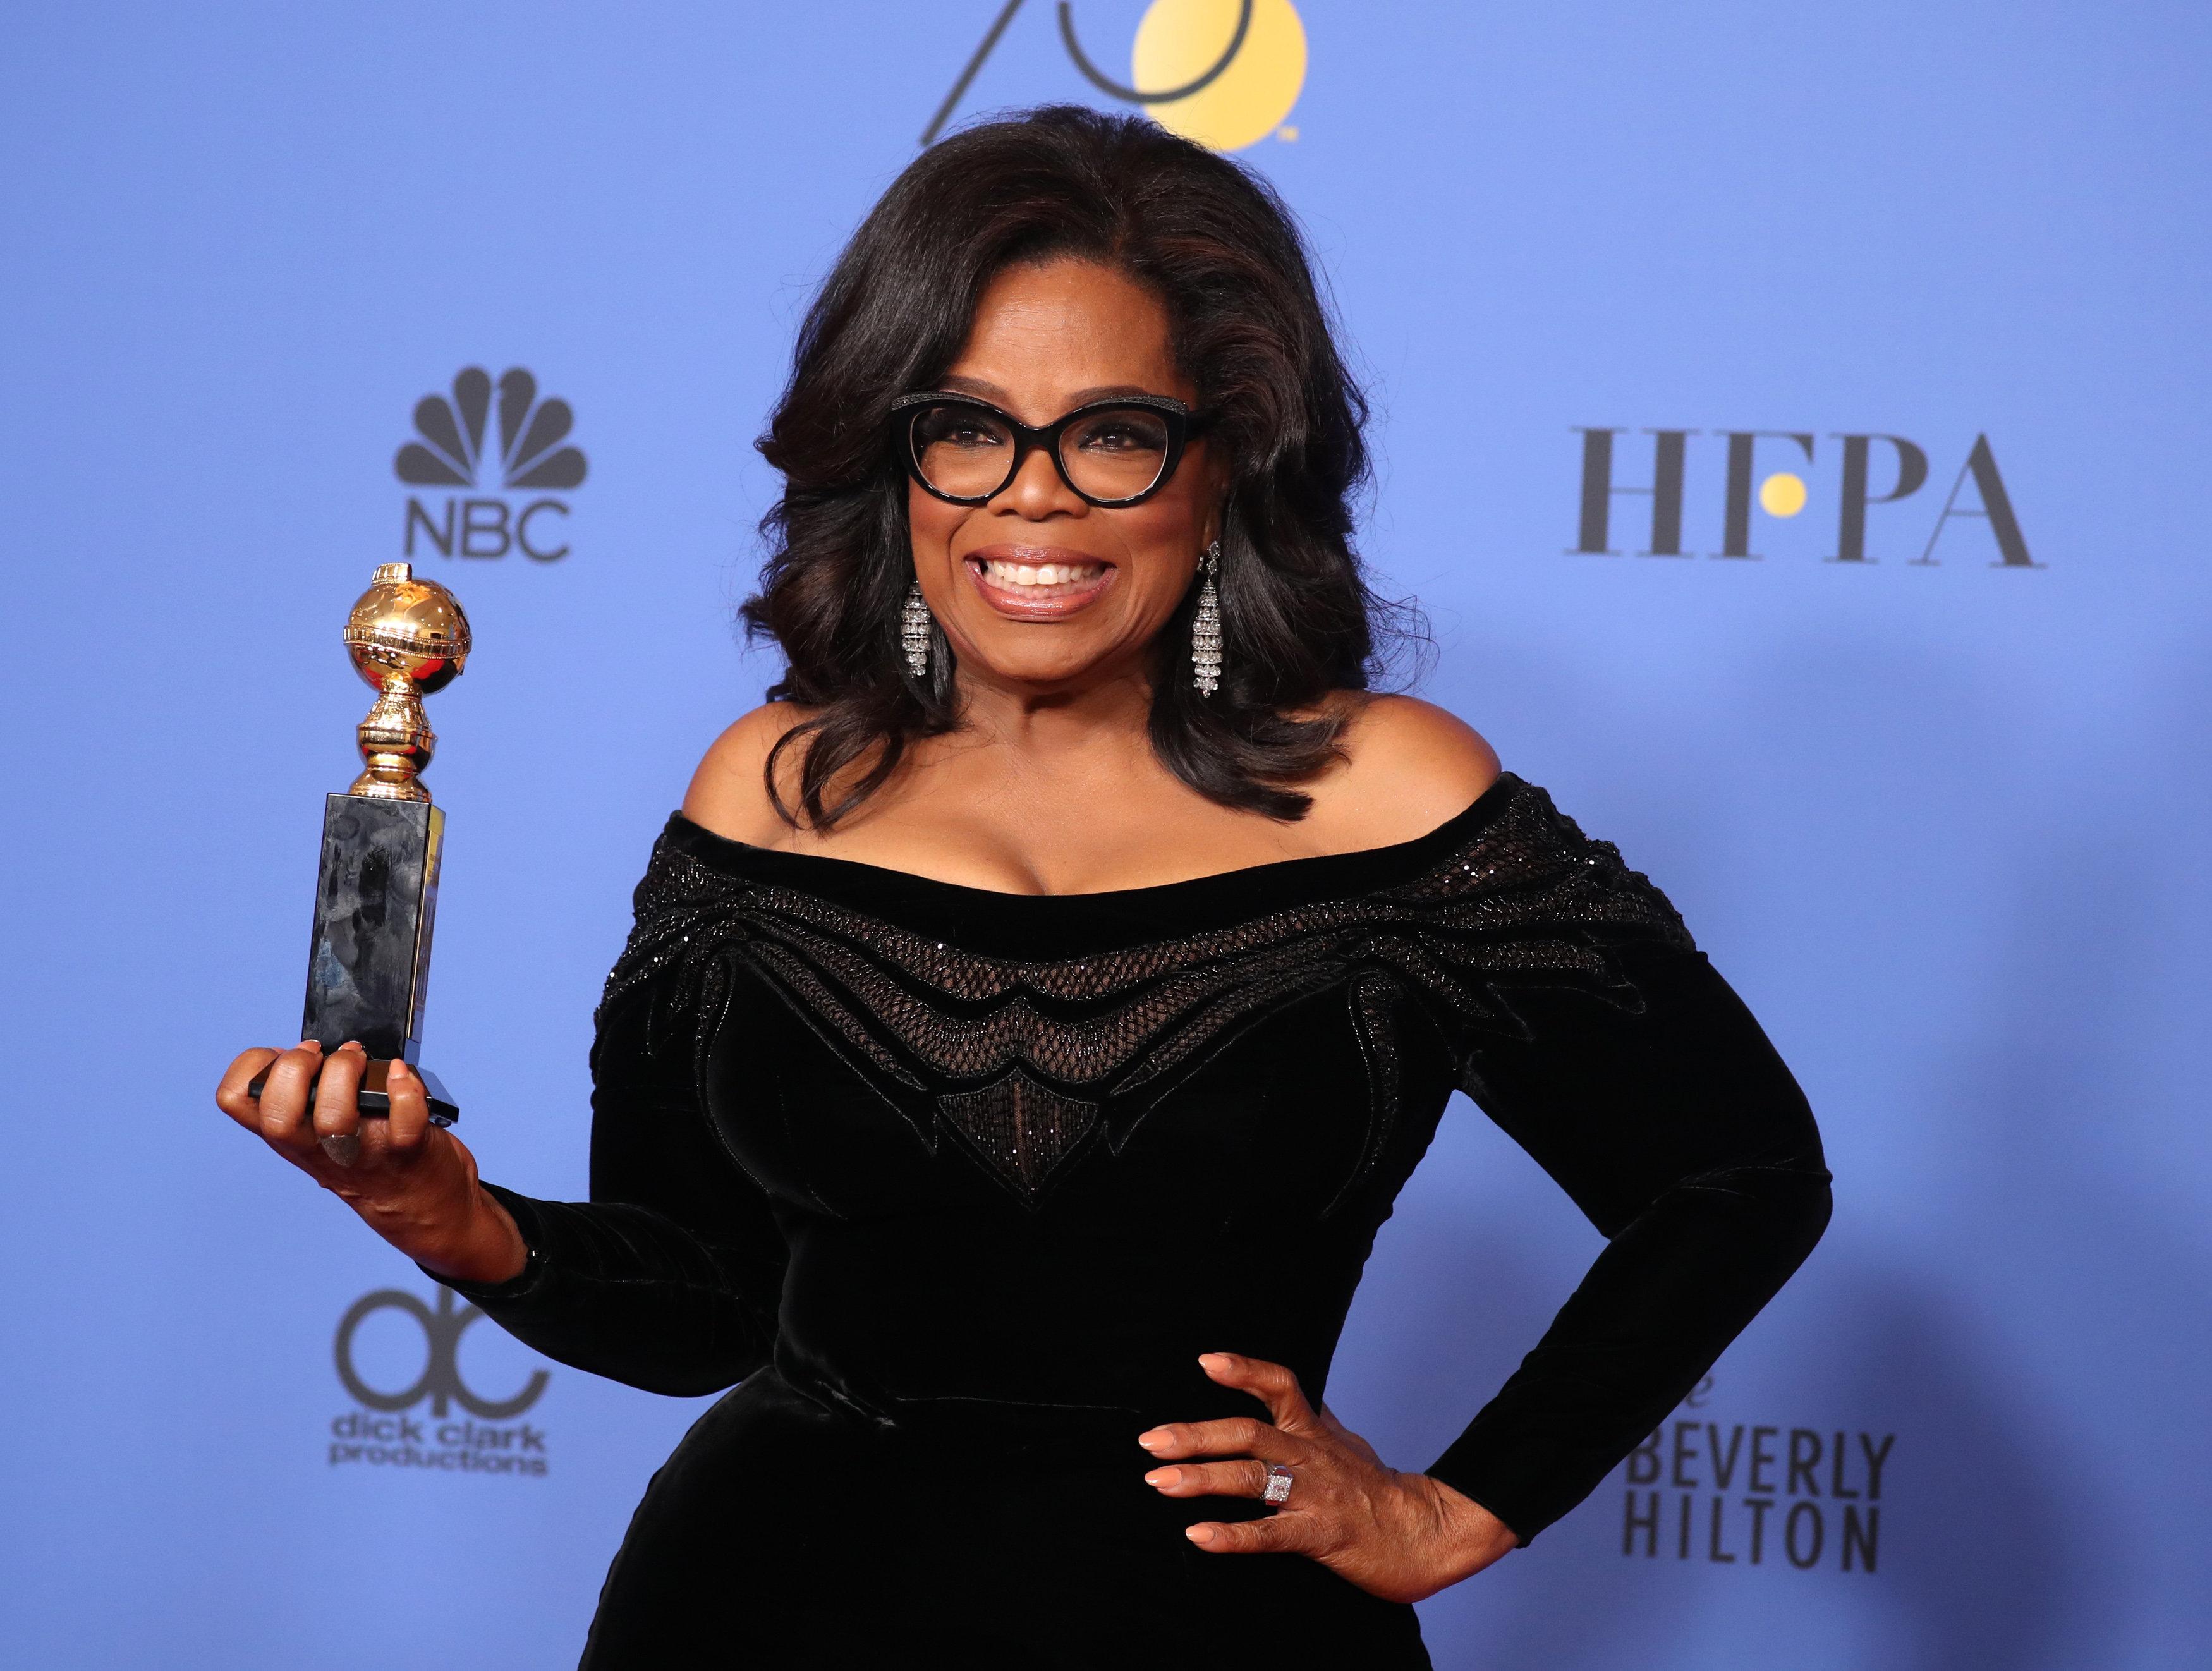 <strong>Daniel met Oprah at the Golden Globes</strong>